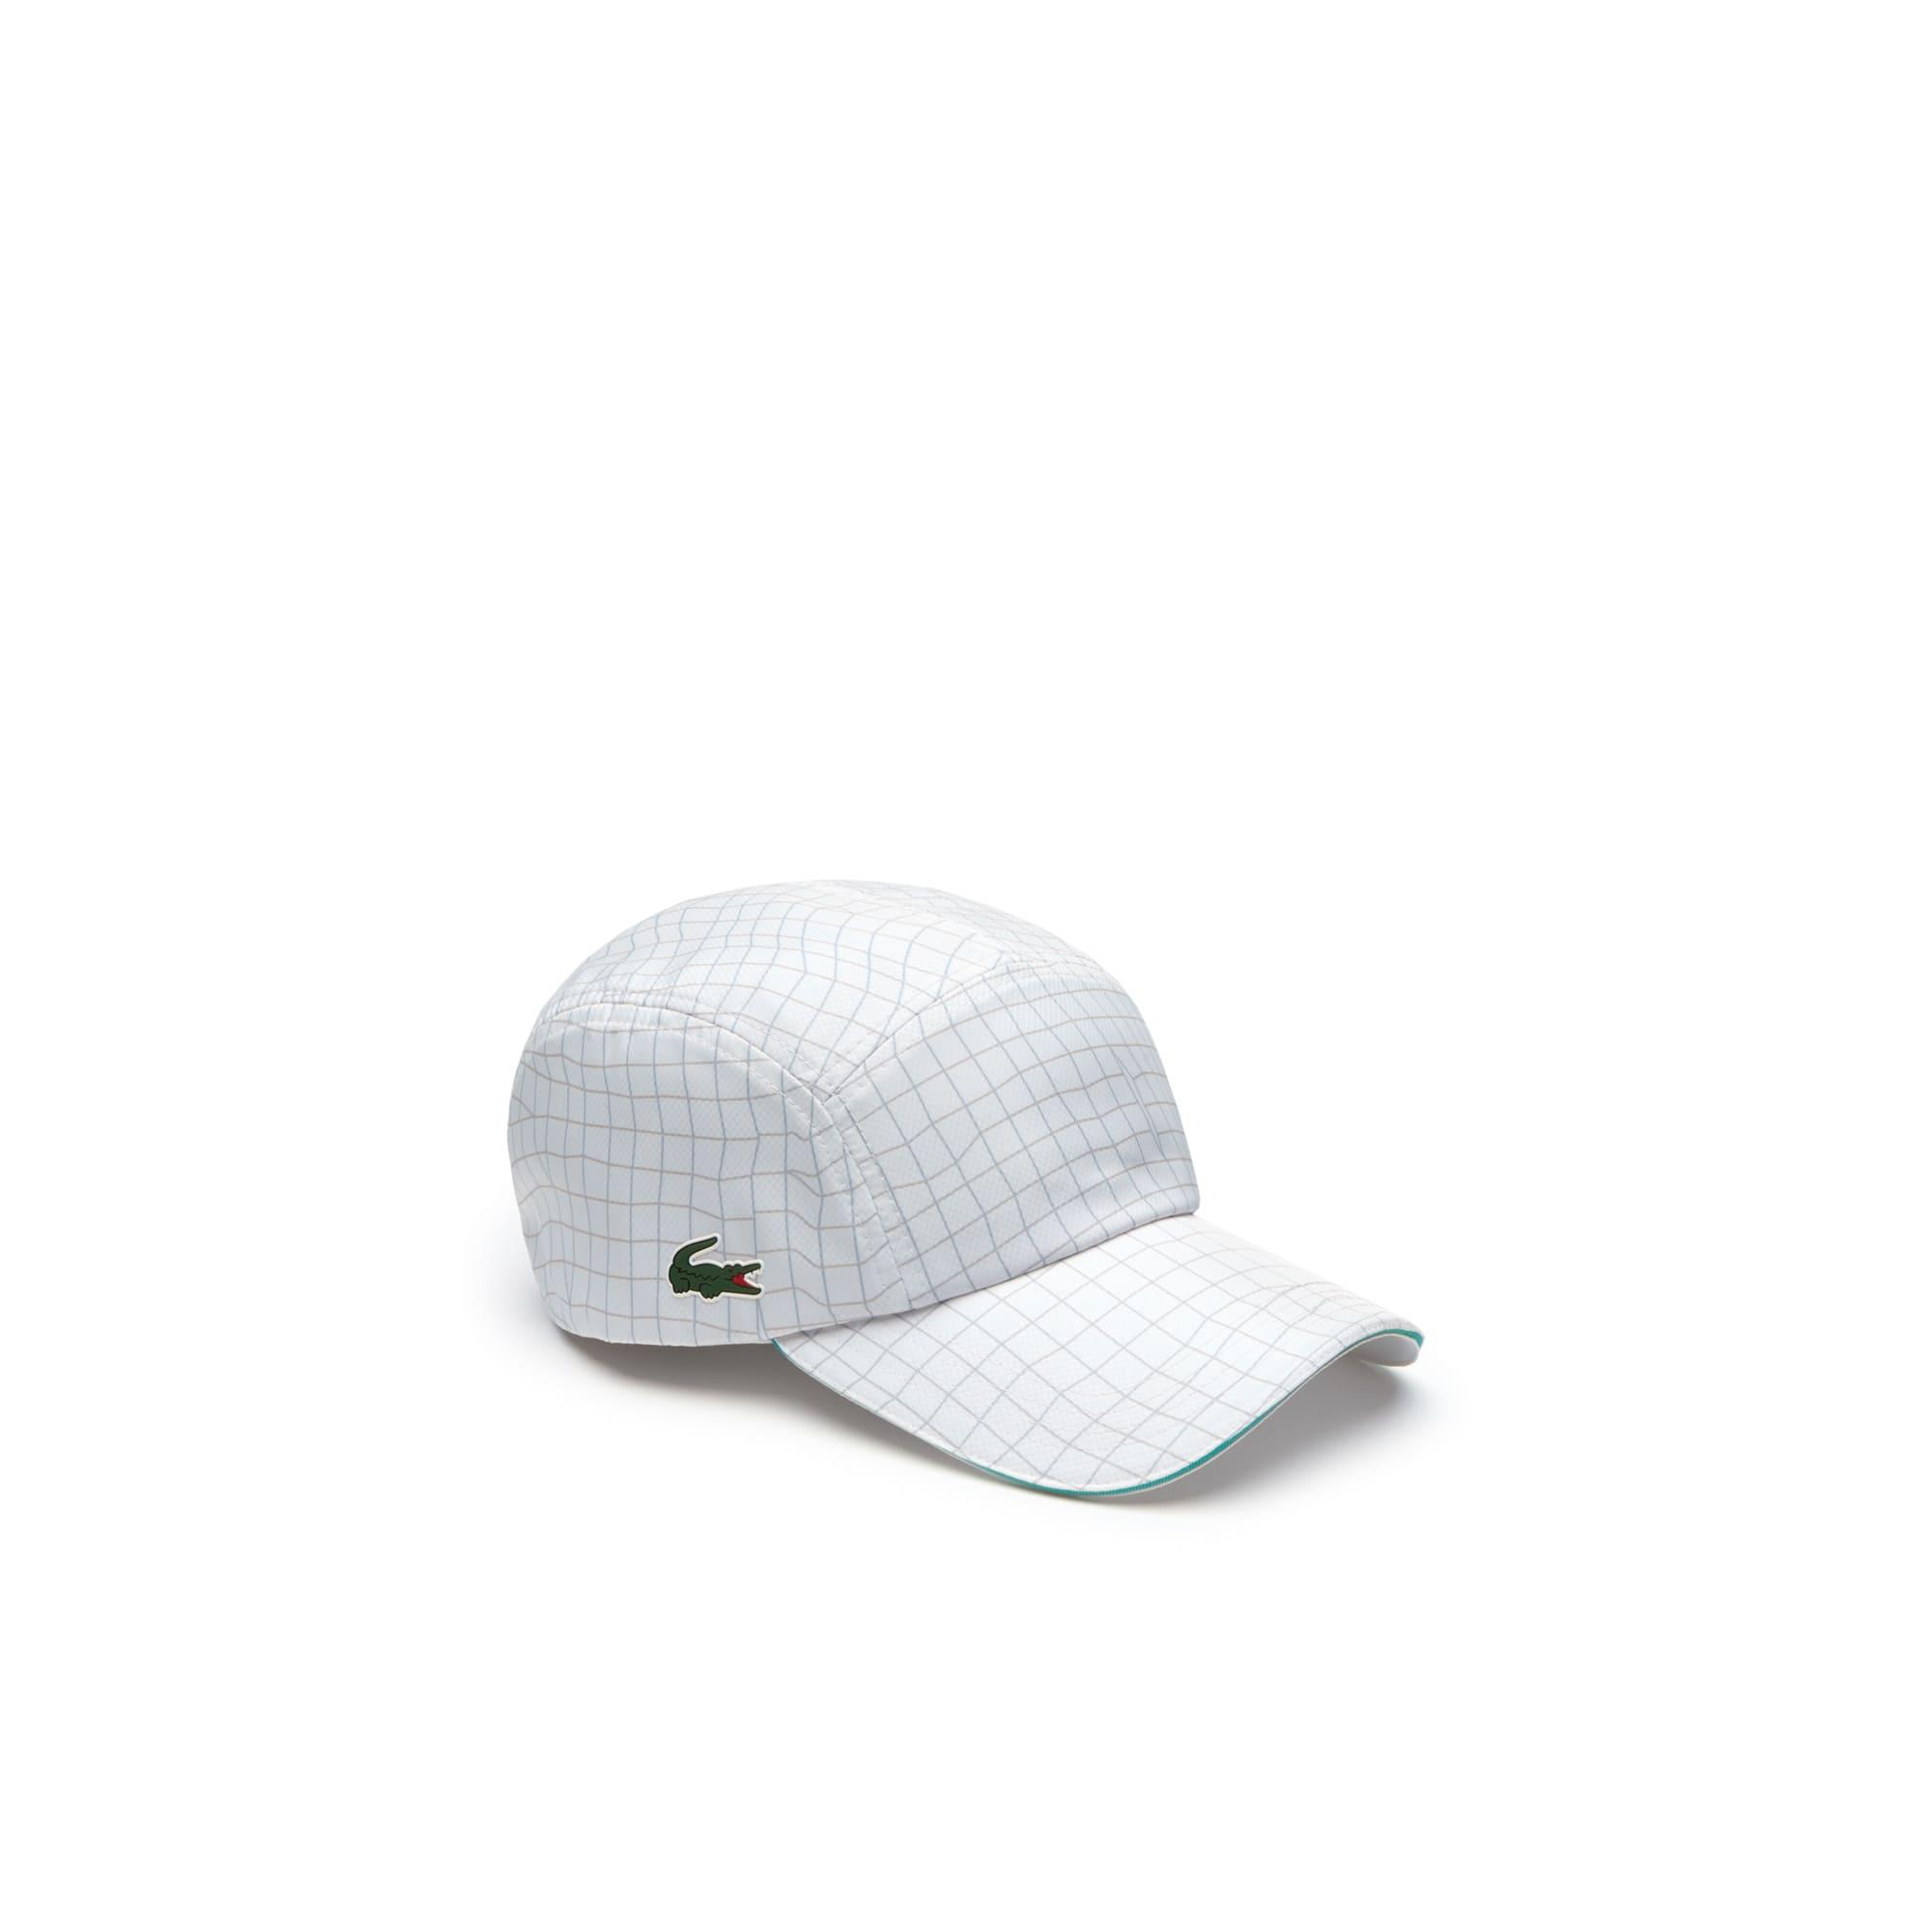 Gorra de hombre Lacoste SPORT Tennis en tafetán con diseño color block